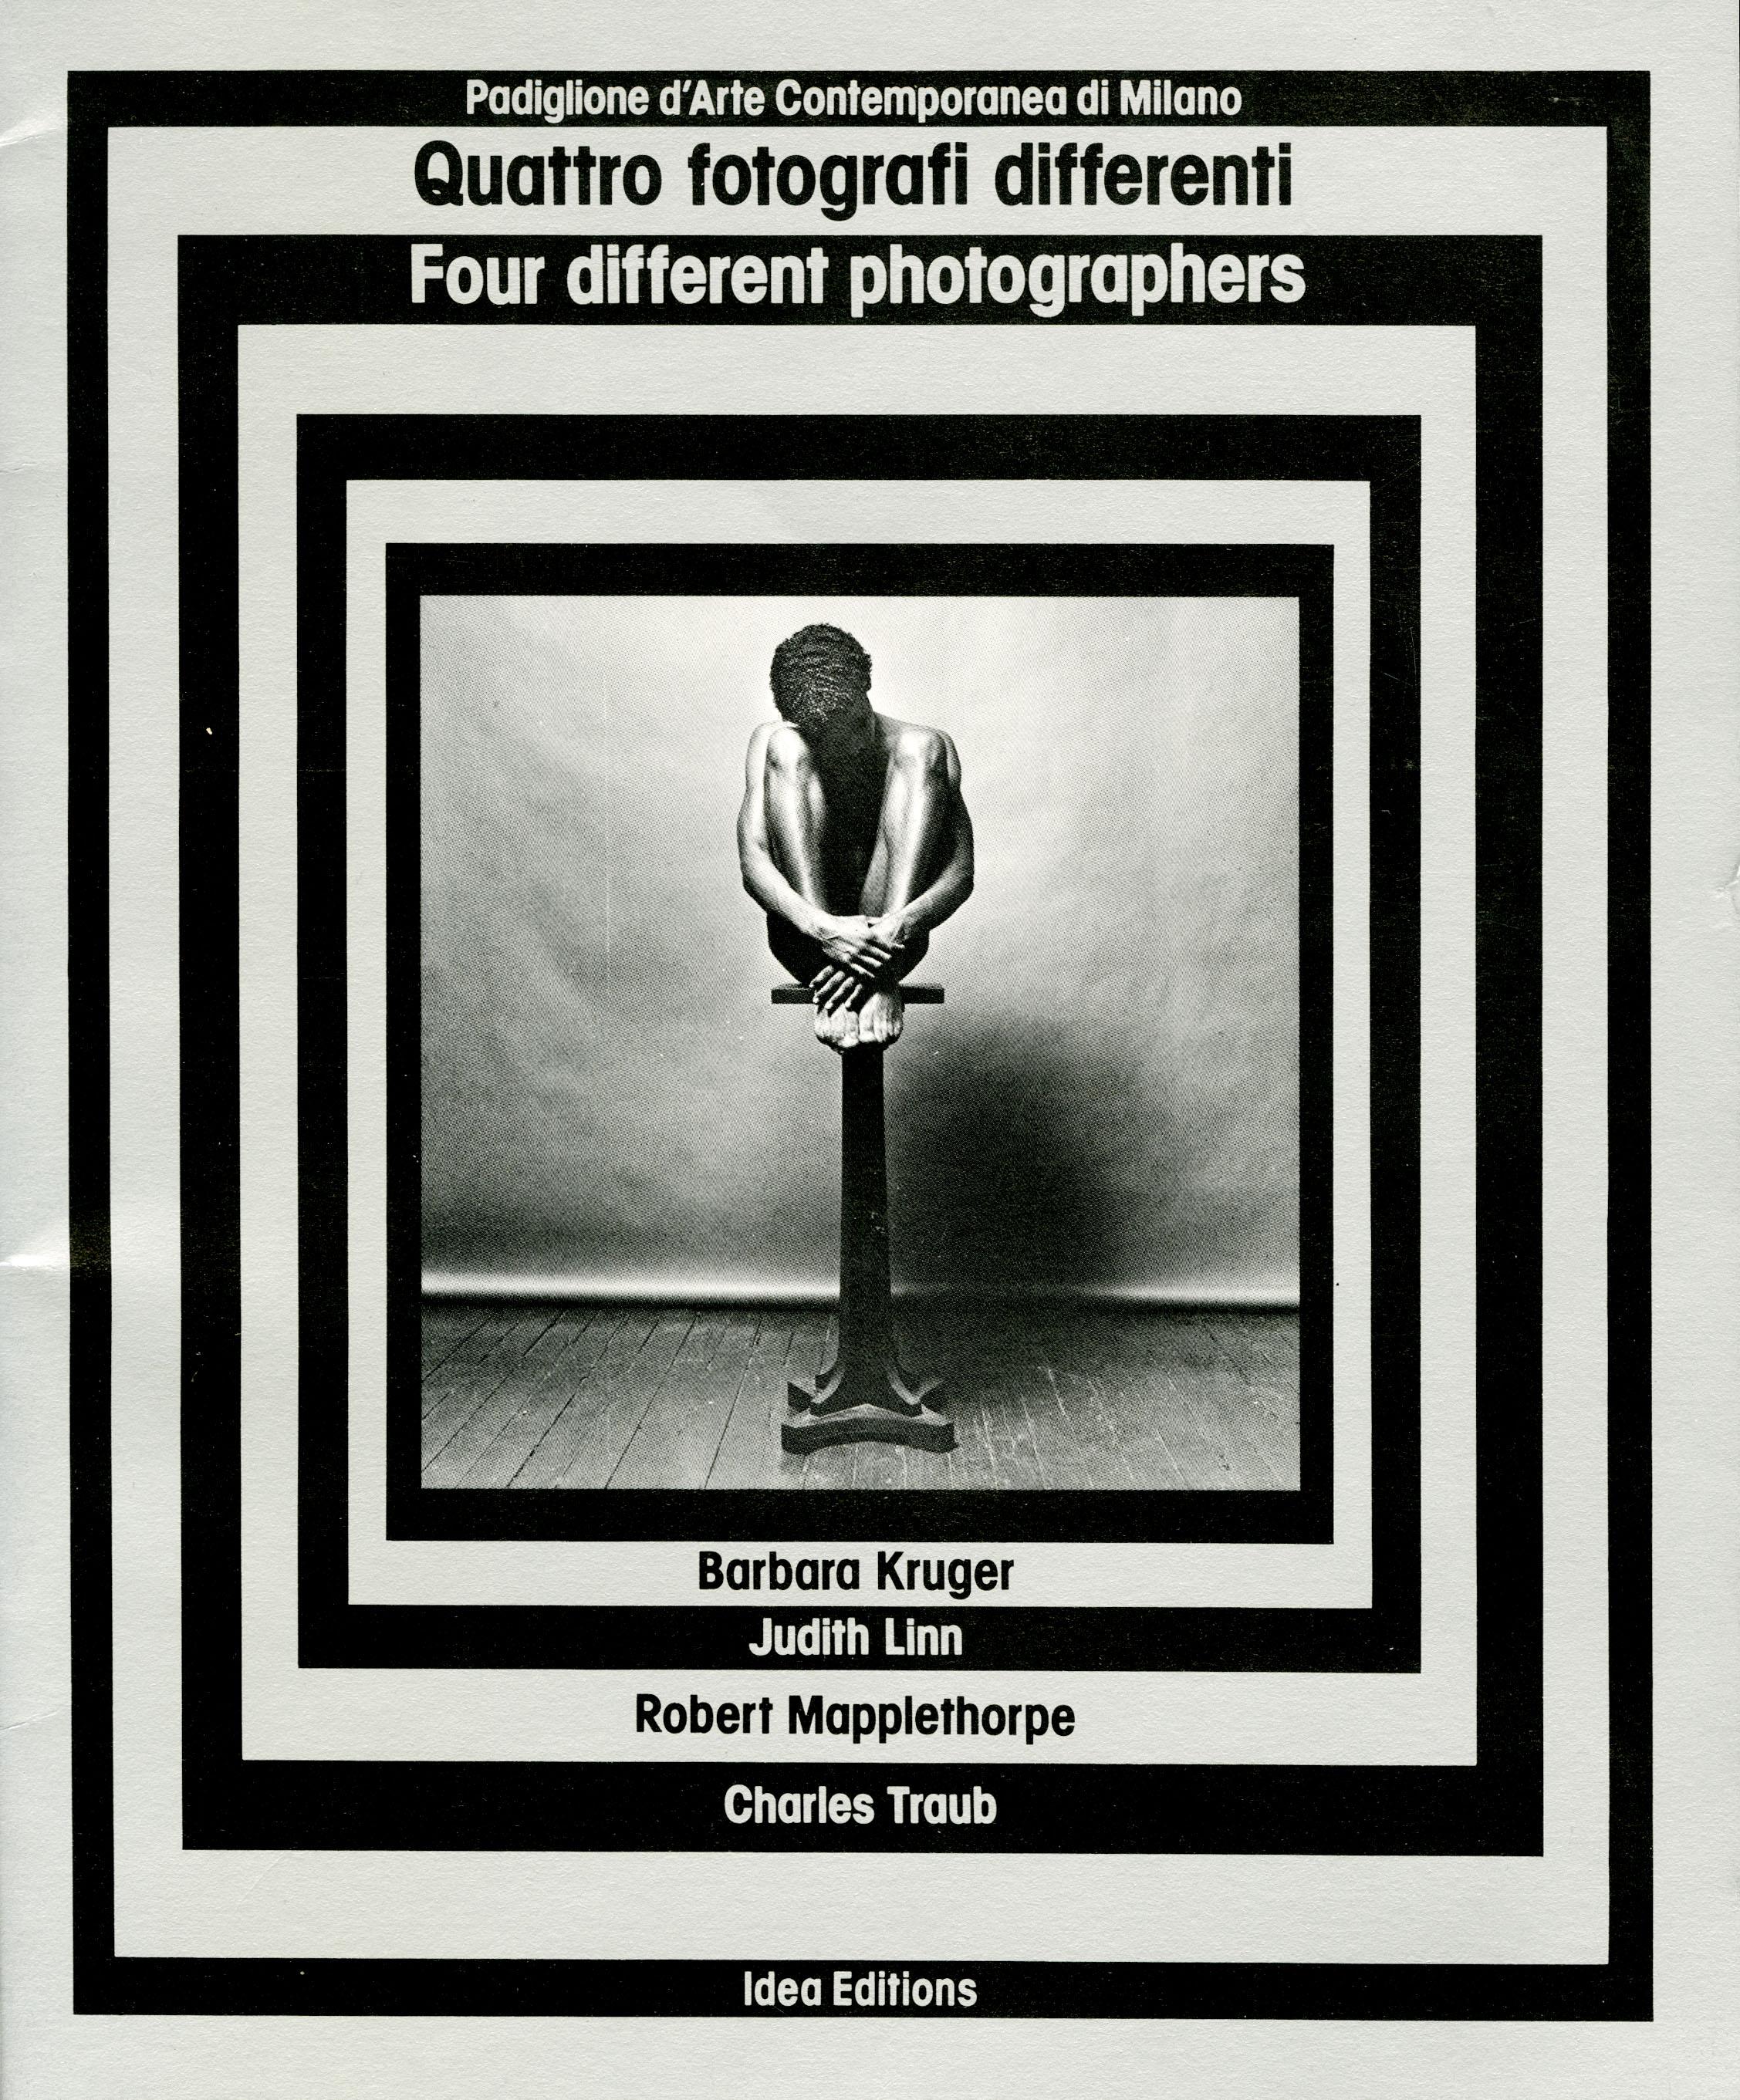 Four Different Photographers - photo+text - April 1980 001.jpg